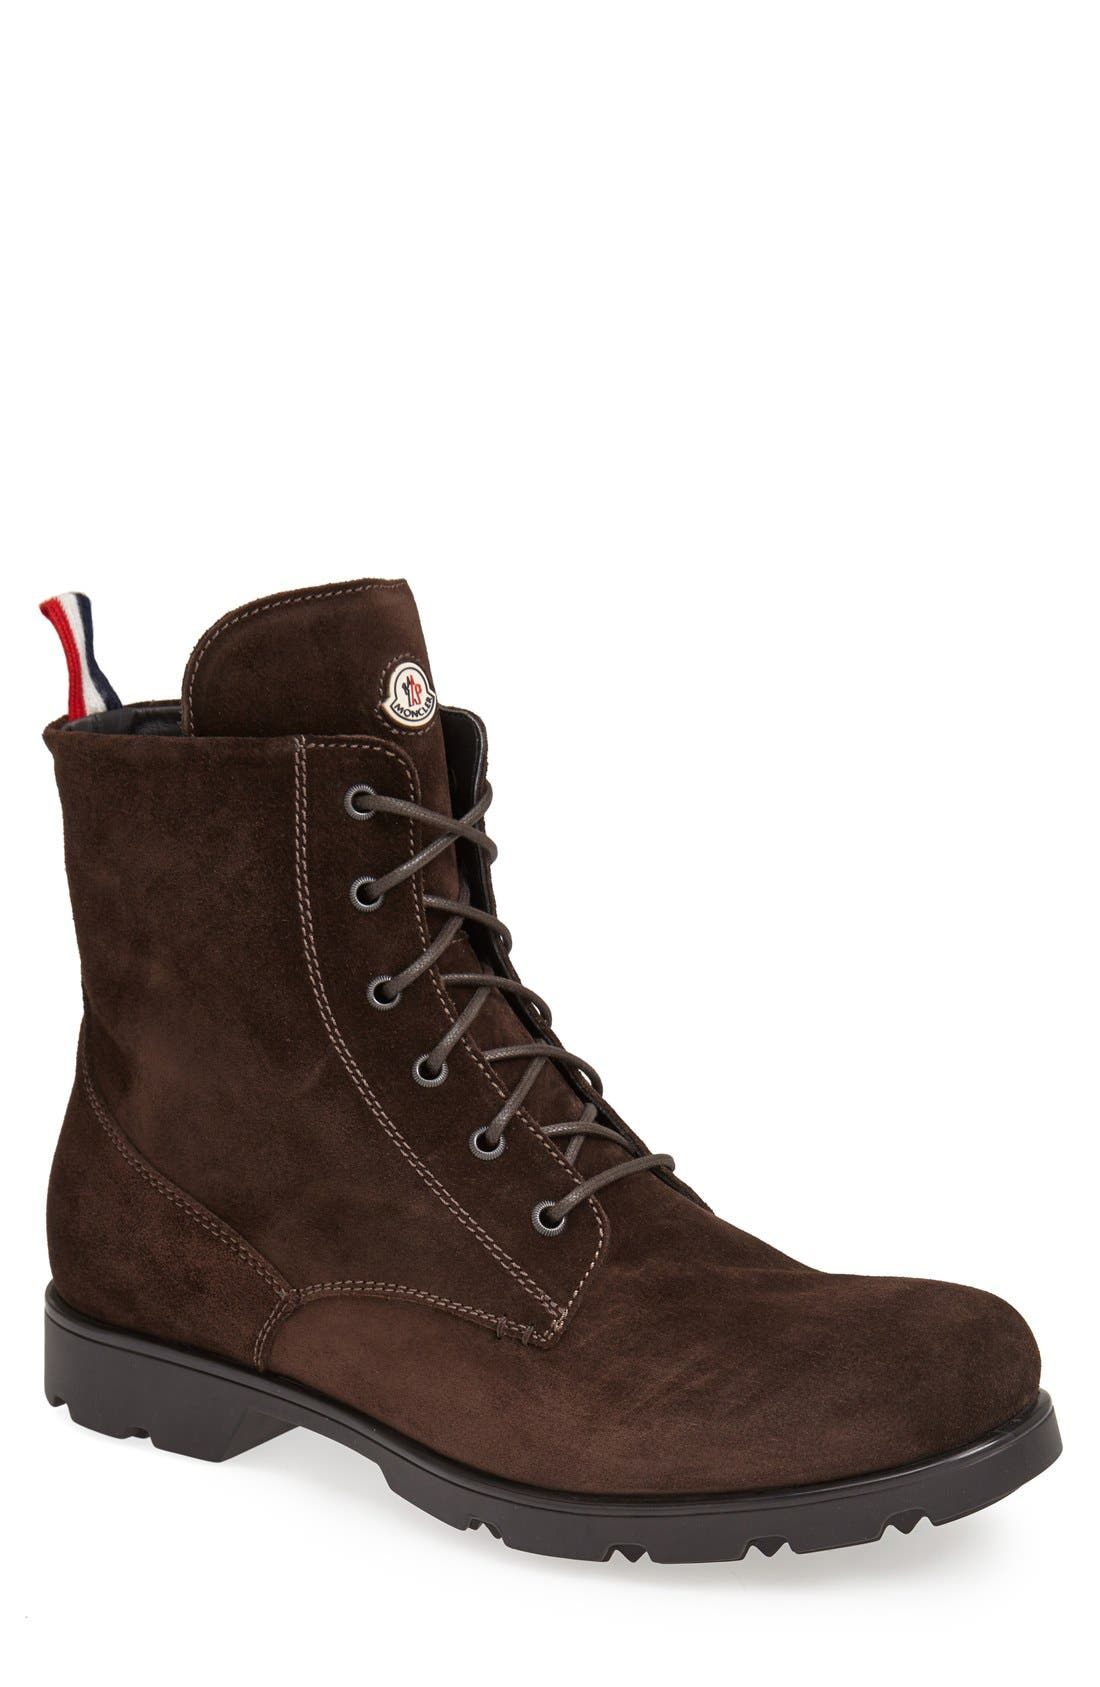 Alternate Image 1 Selected - Moncler 'Vancouver' Plain Toe Boot (Men)